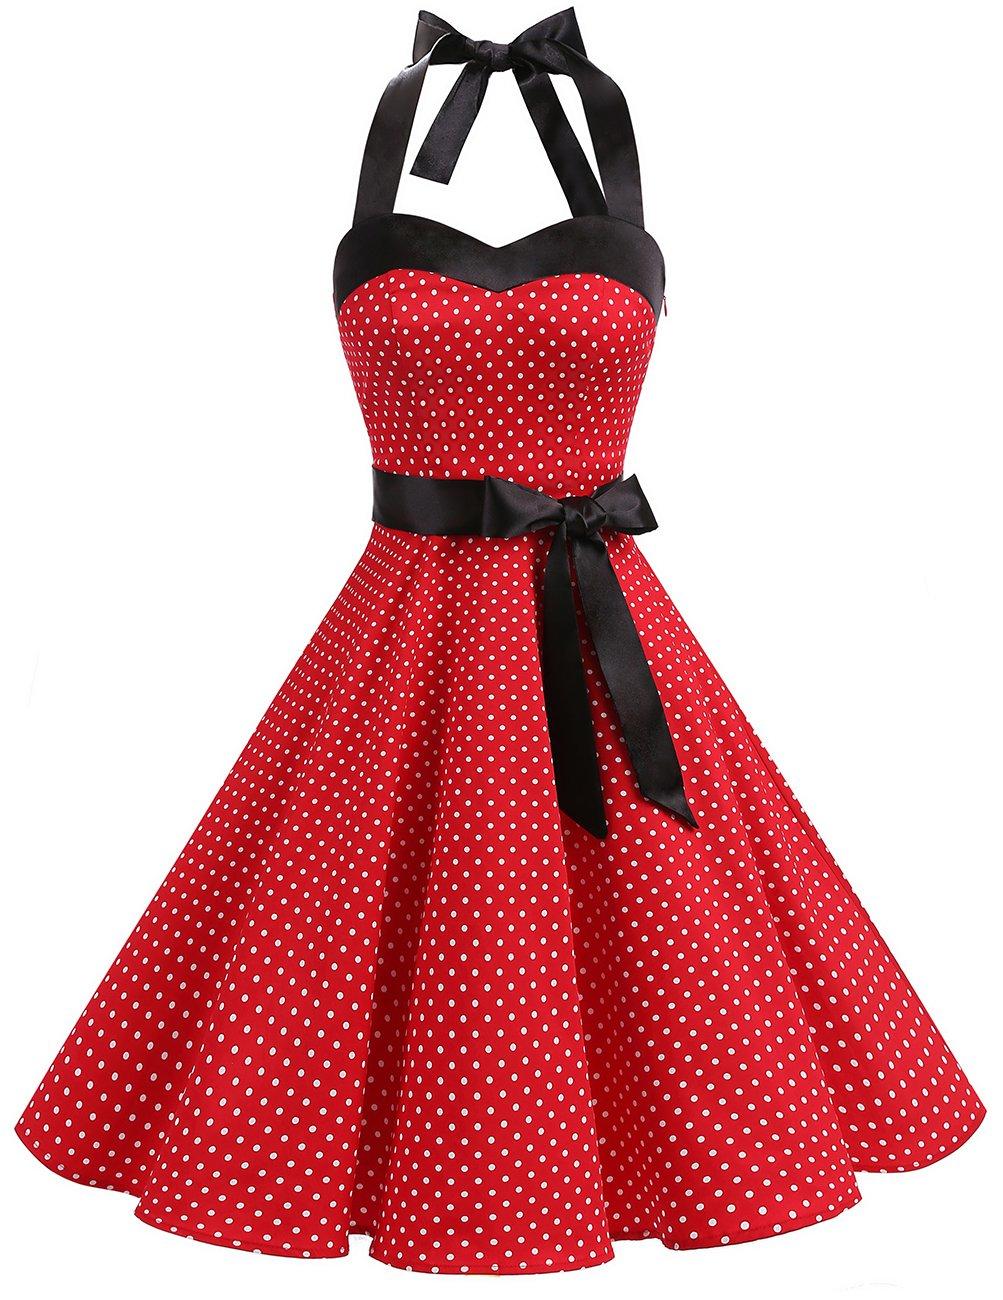 7243147948f DRESSTELLS 50s Retro Halter Rockabilly Polka Dots Audrey Dress Cocktail  Dress Red Small White Dot M